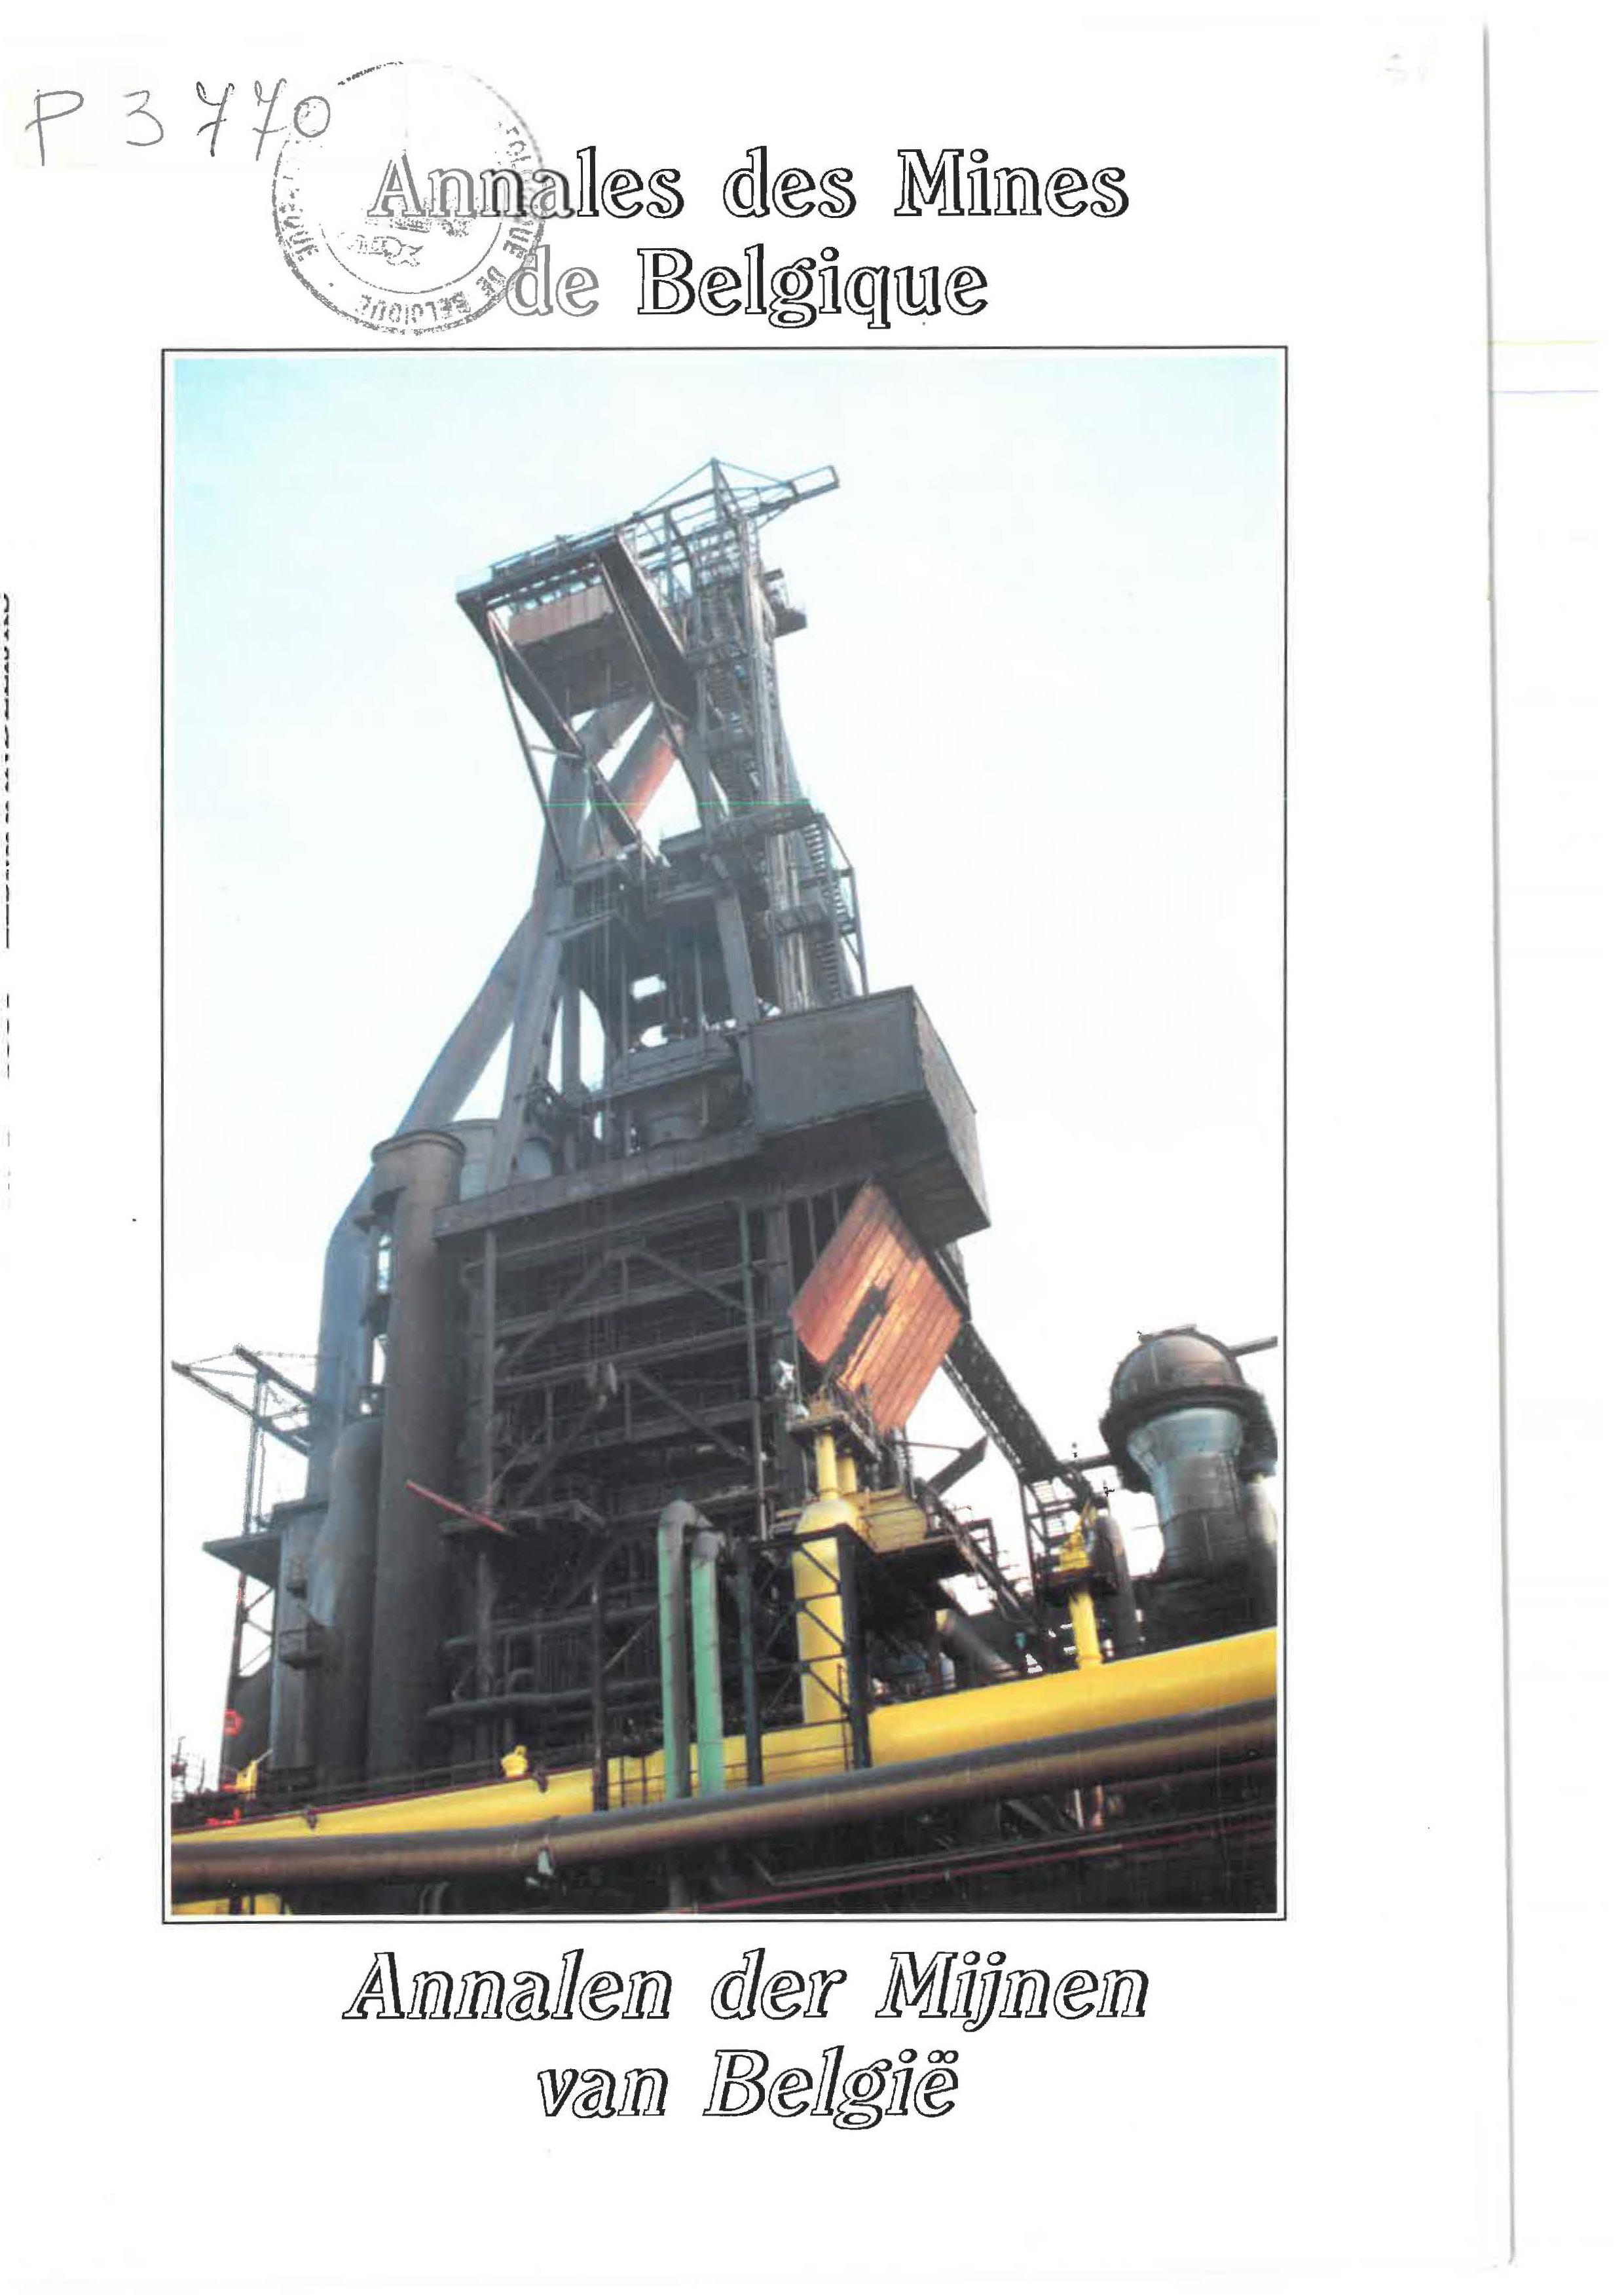 voorpagina 1991 1 Annales des mines de Belgique